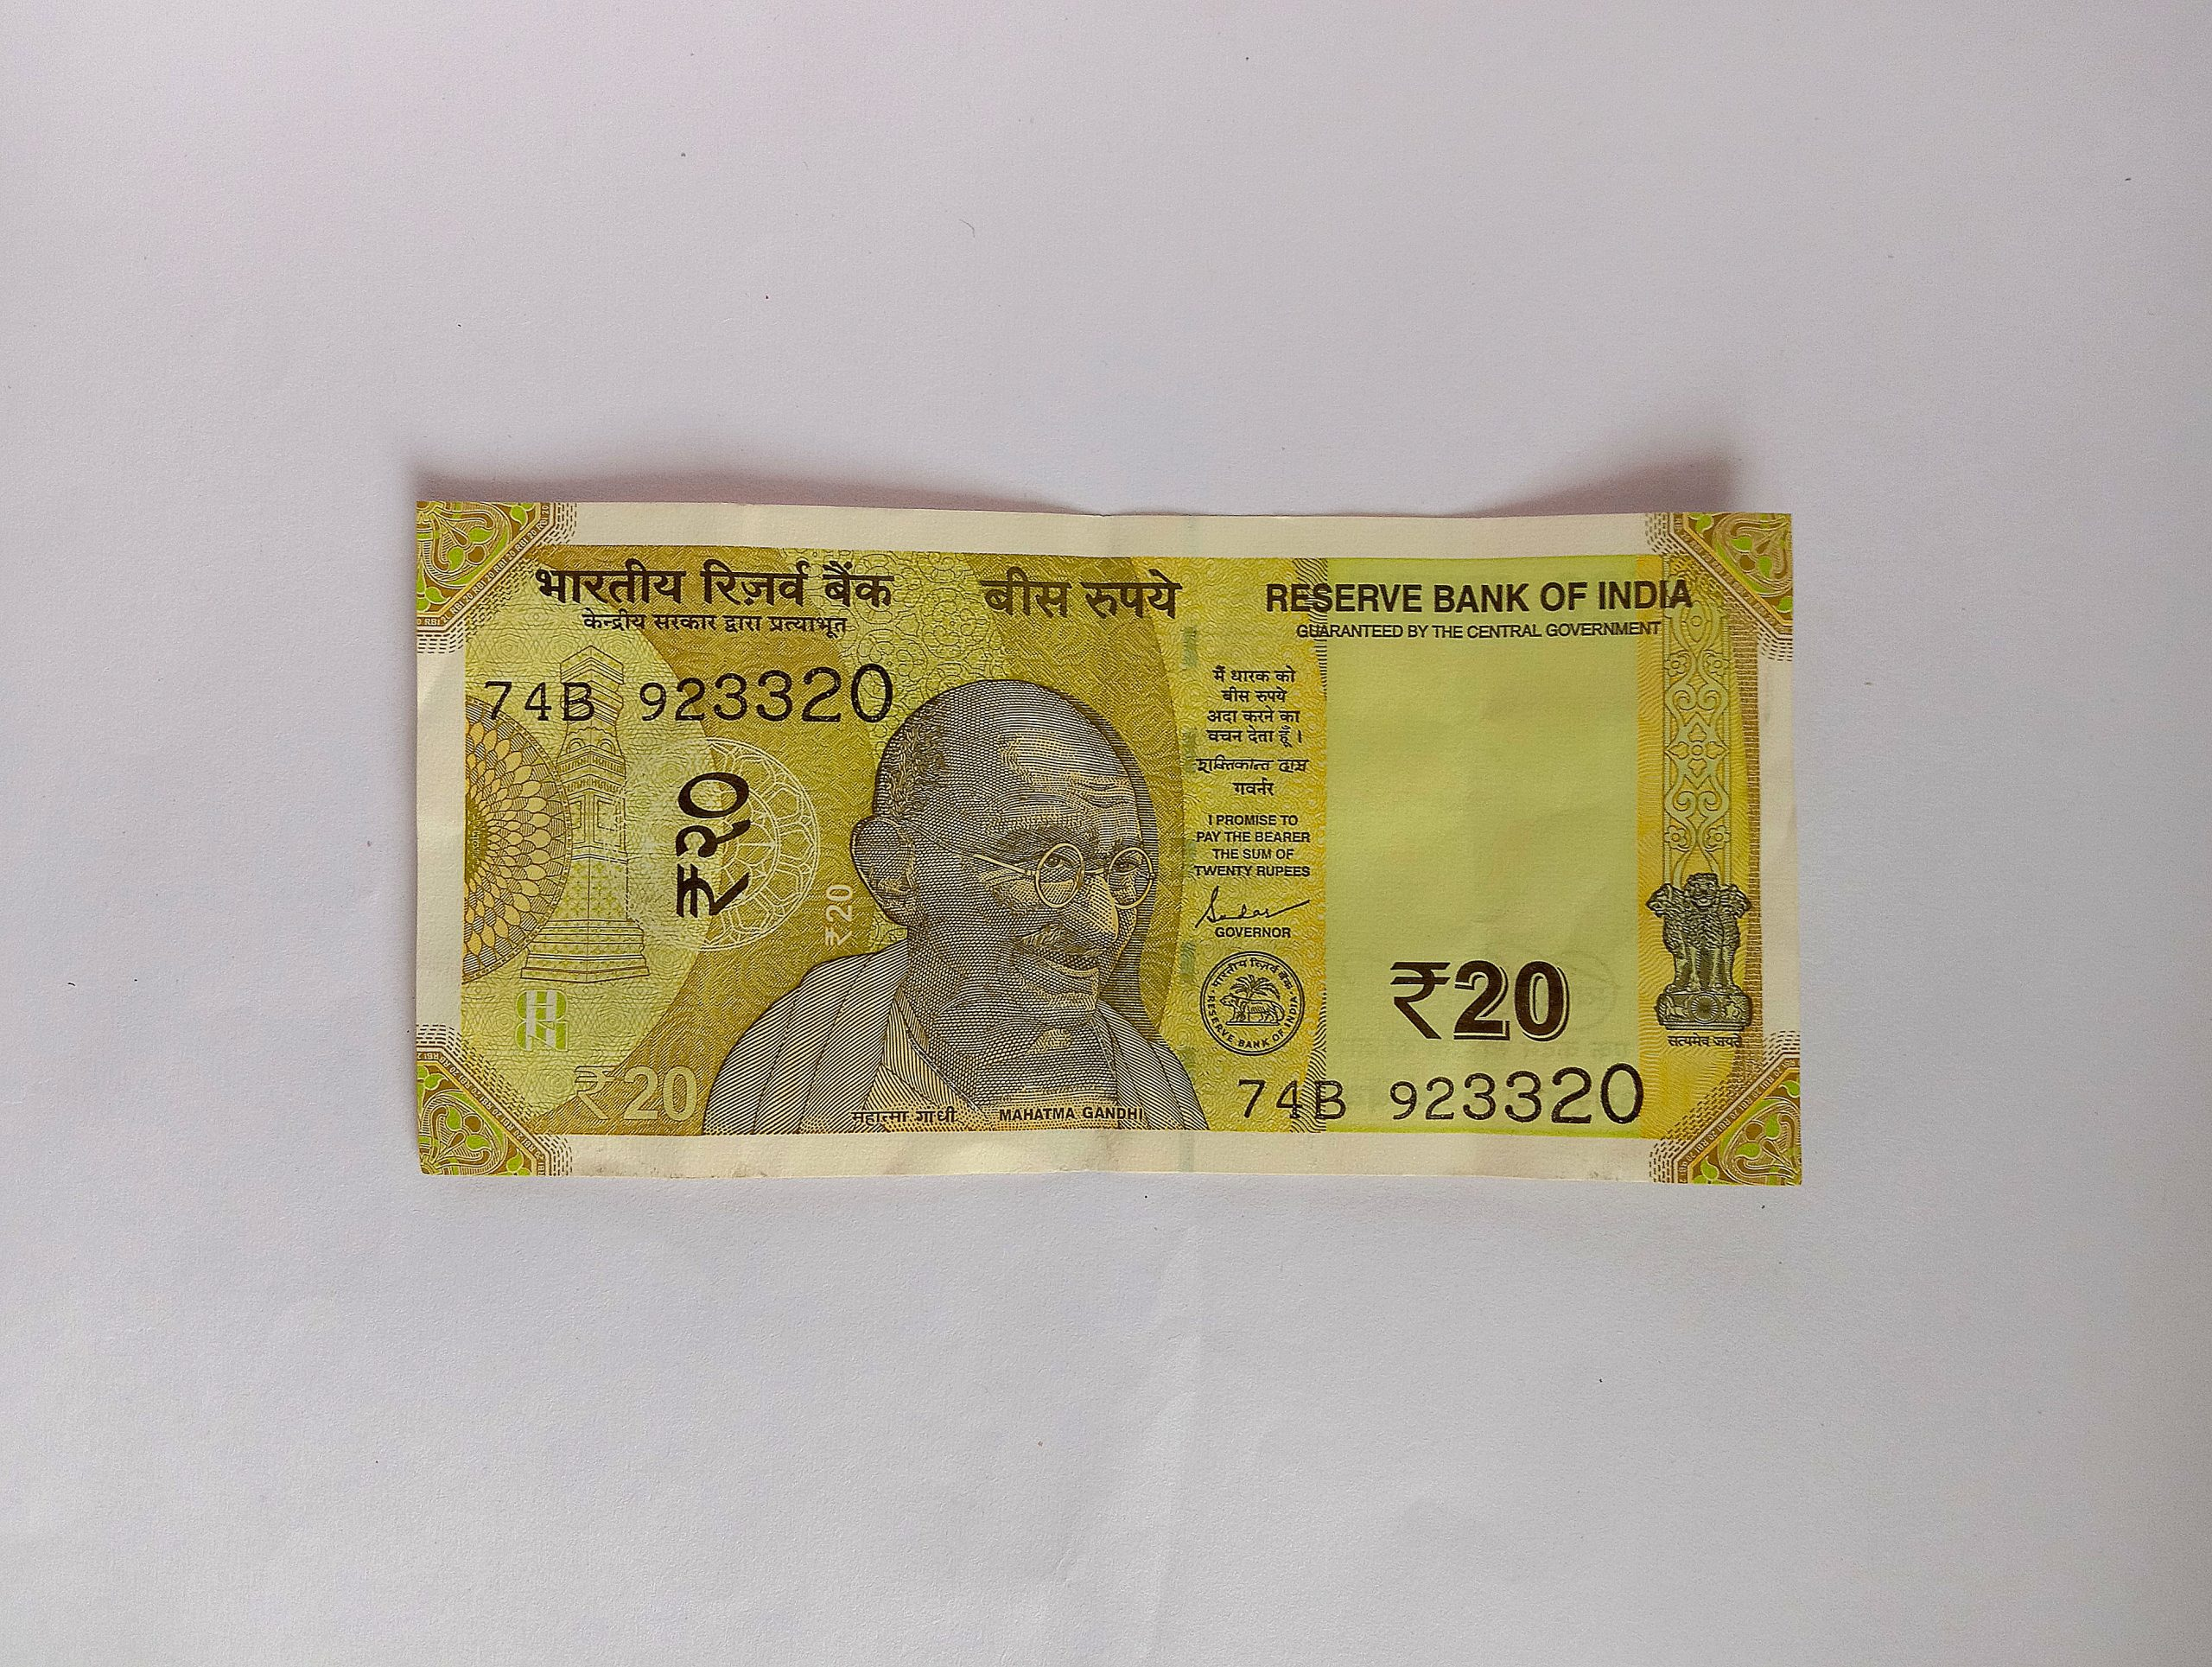 A twenty rupee note